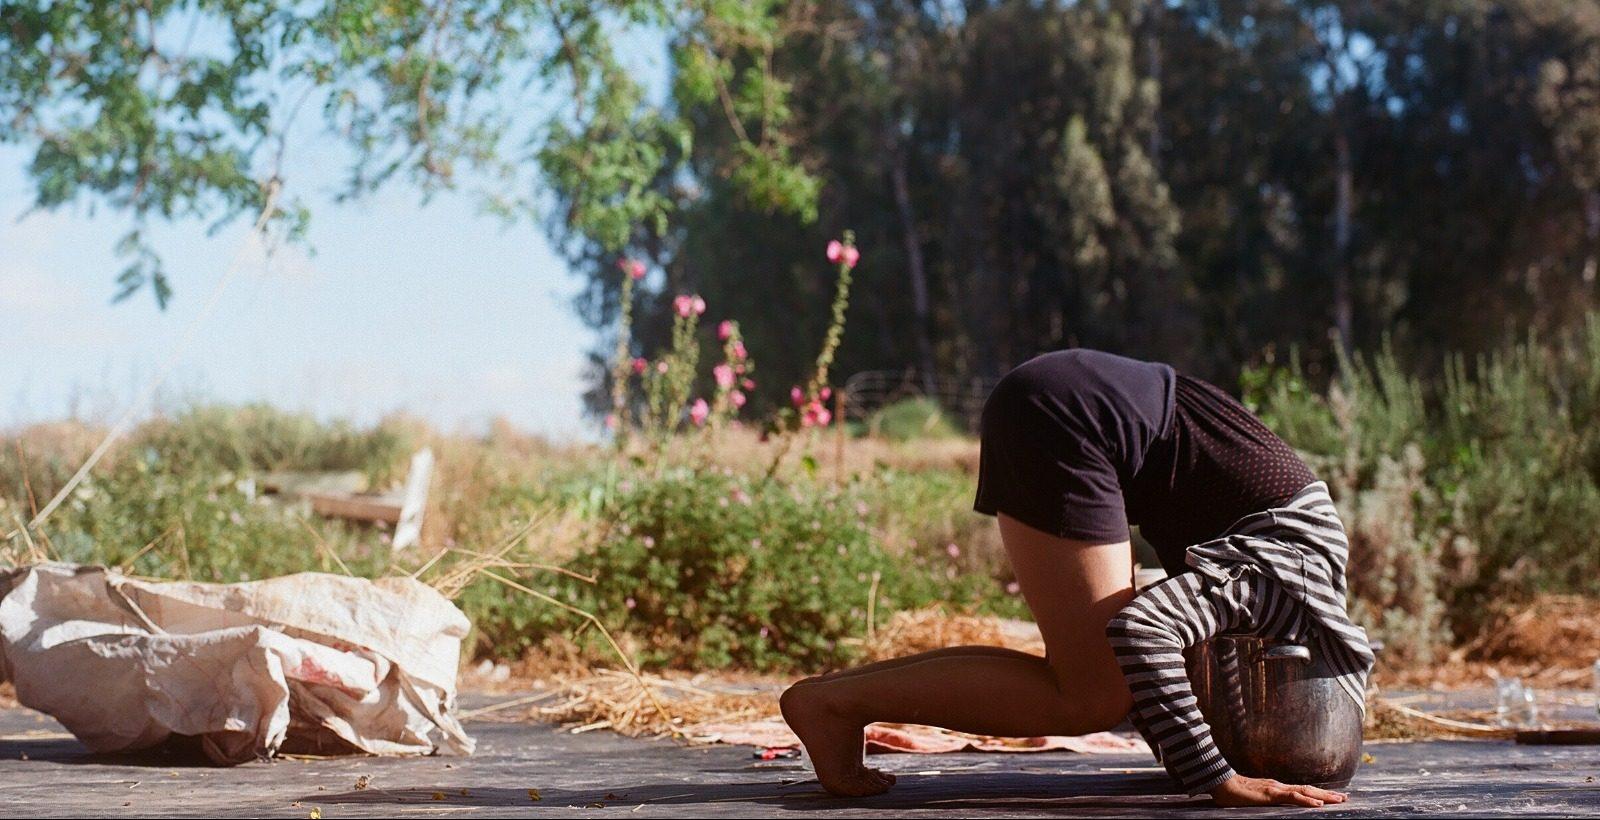 Шдемама. Фото - © Омер Месингер. הות אמן ביער המאכל שדמאמא. צילום - עומר מסינגר